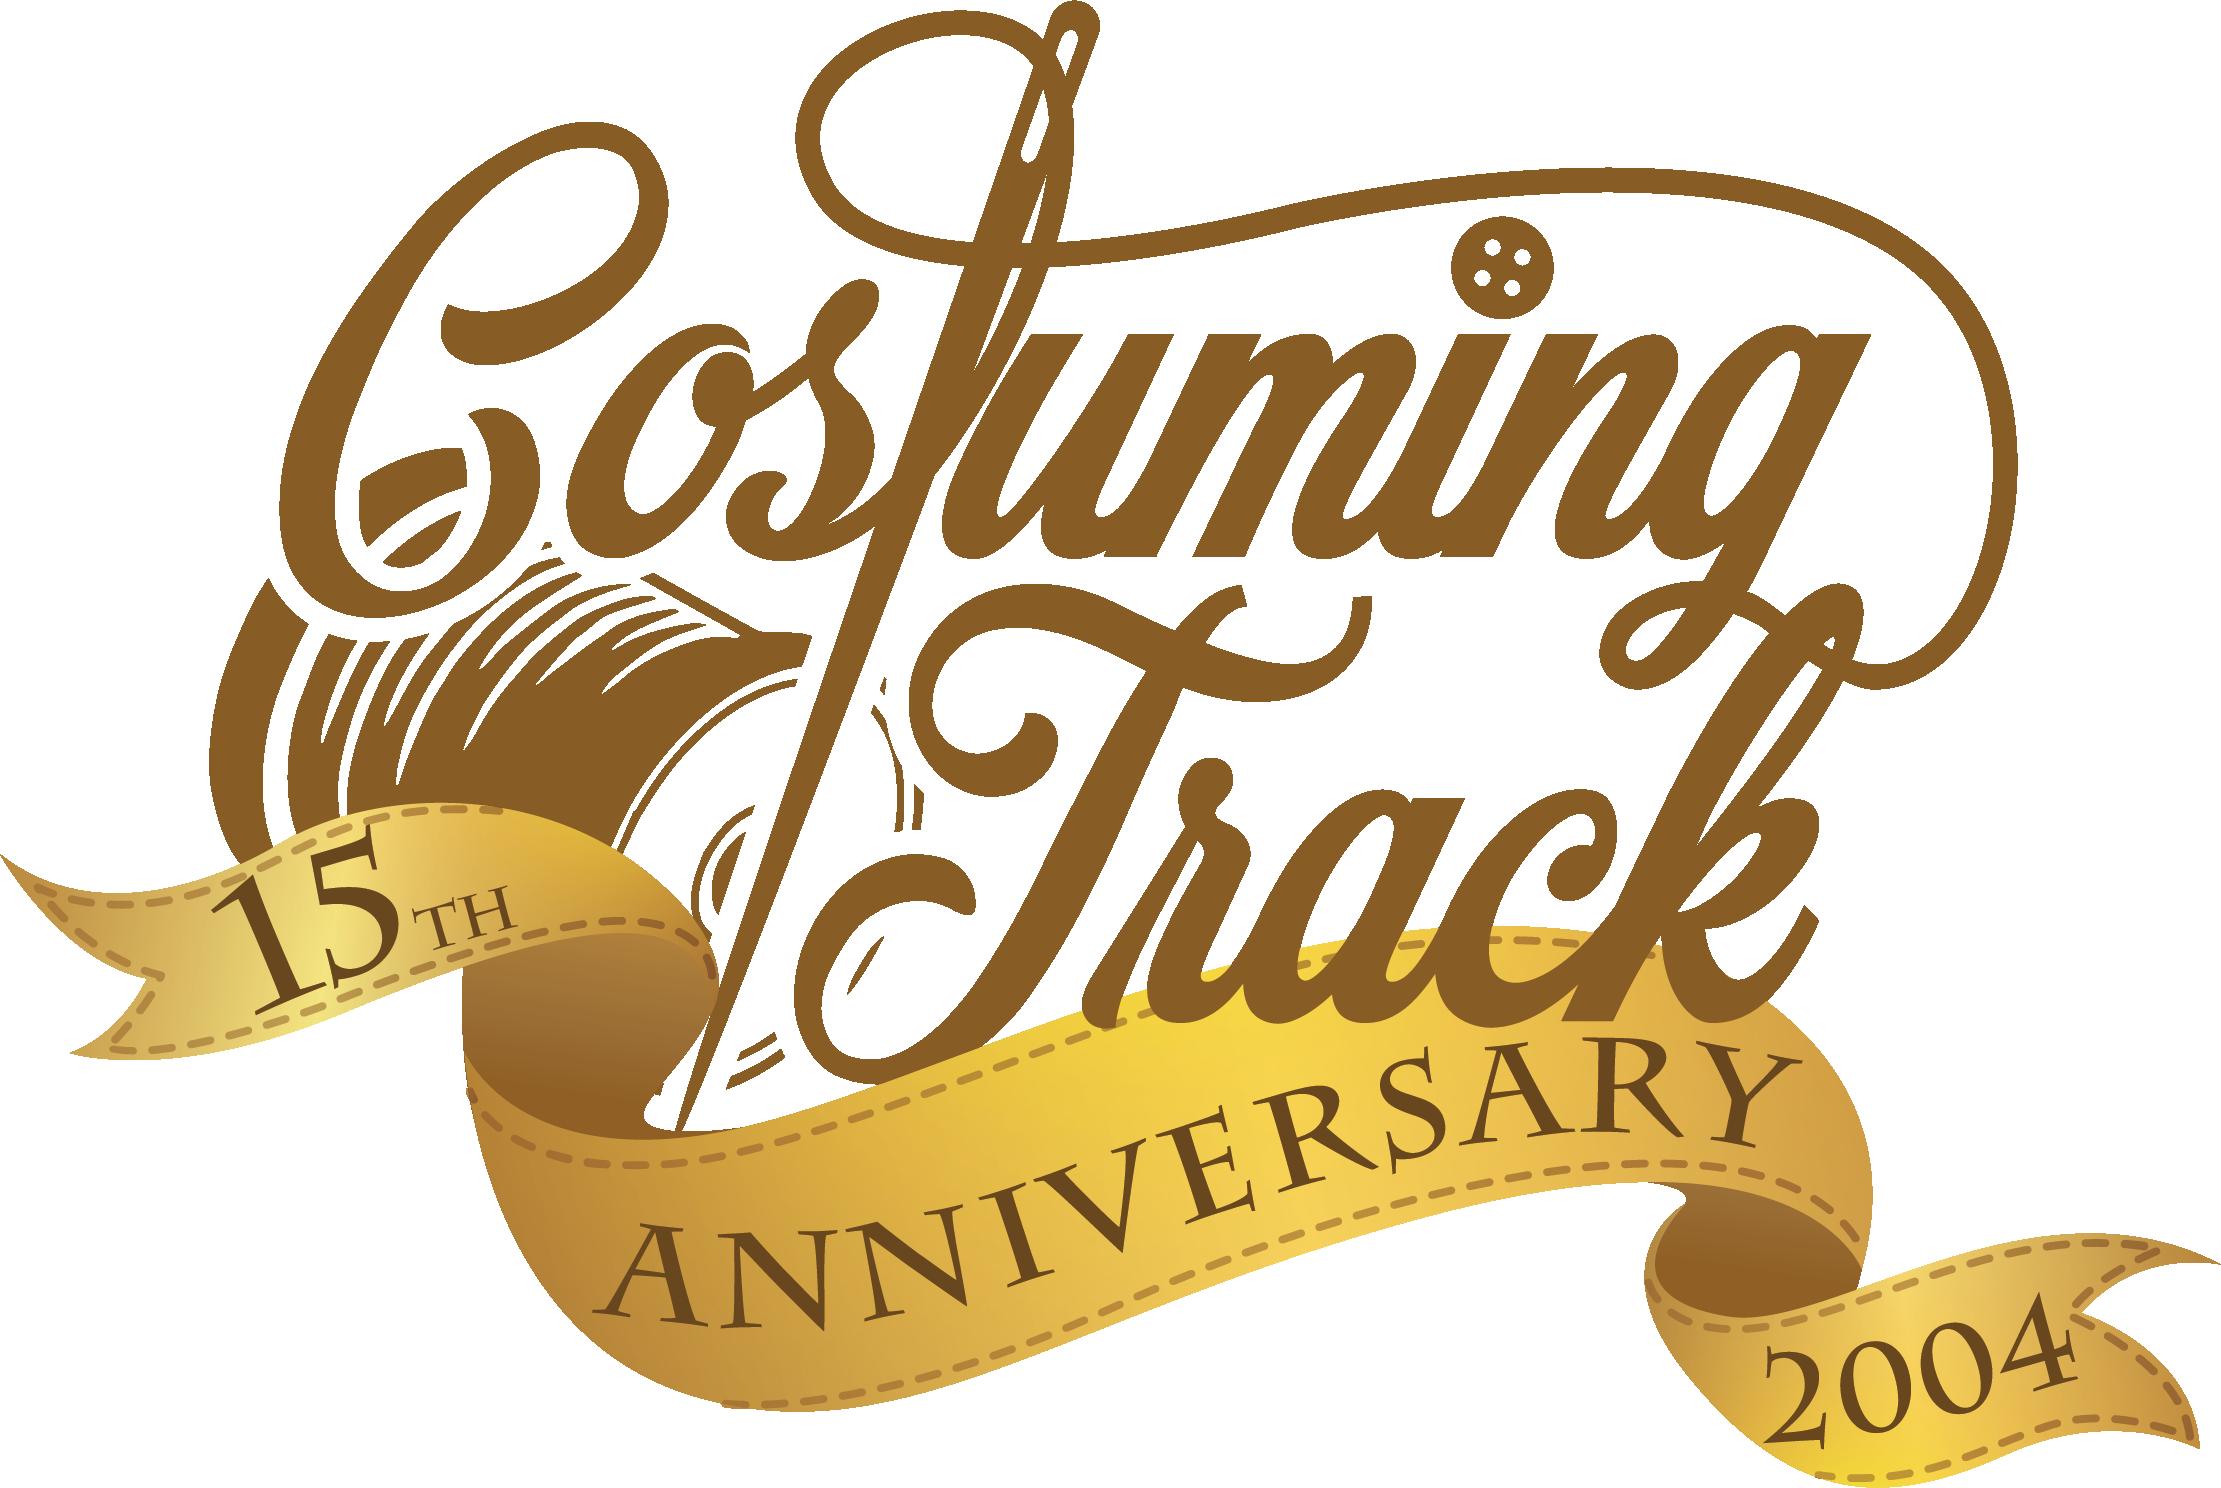 Costuming Track